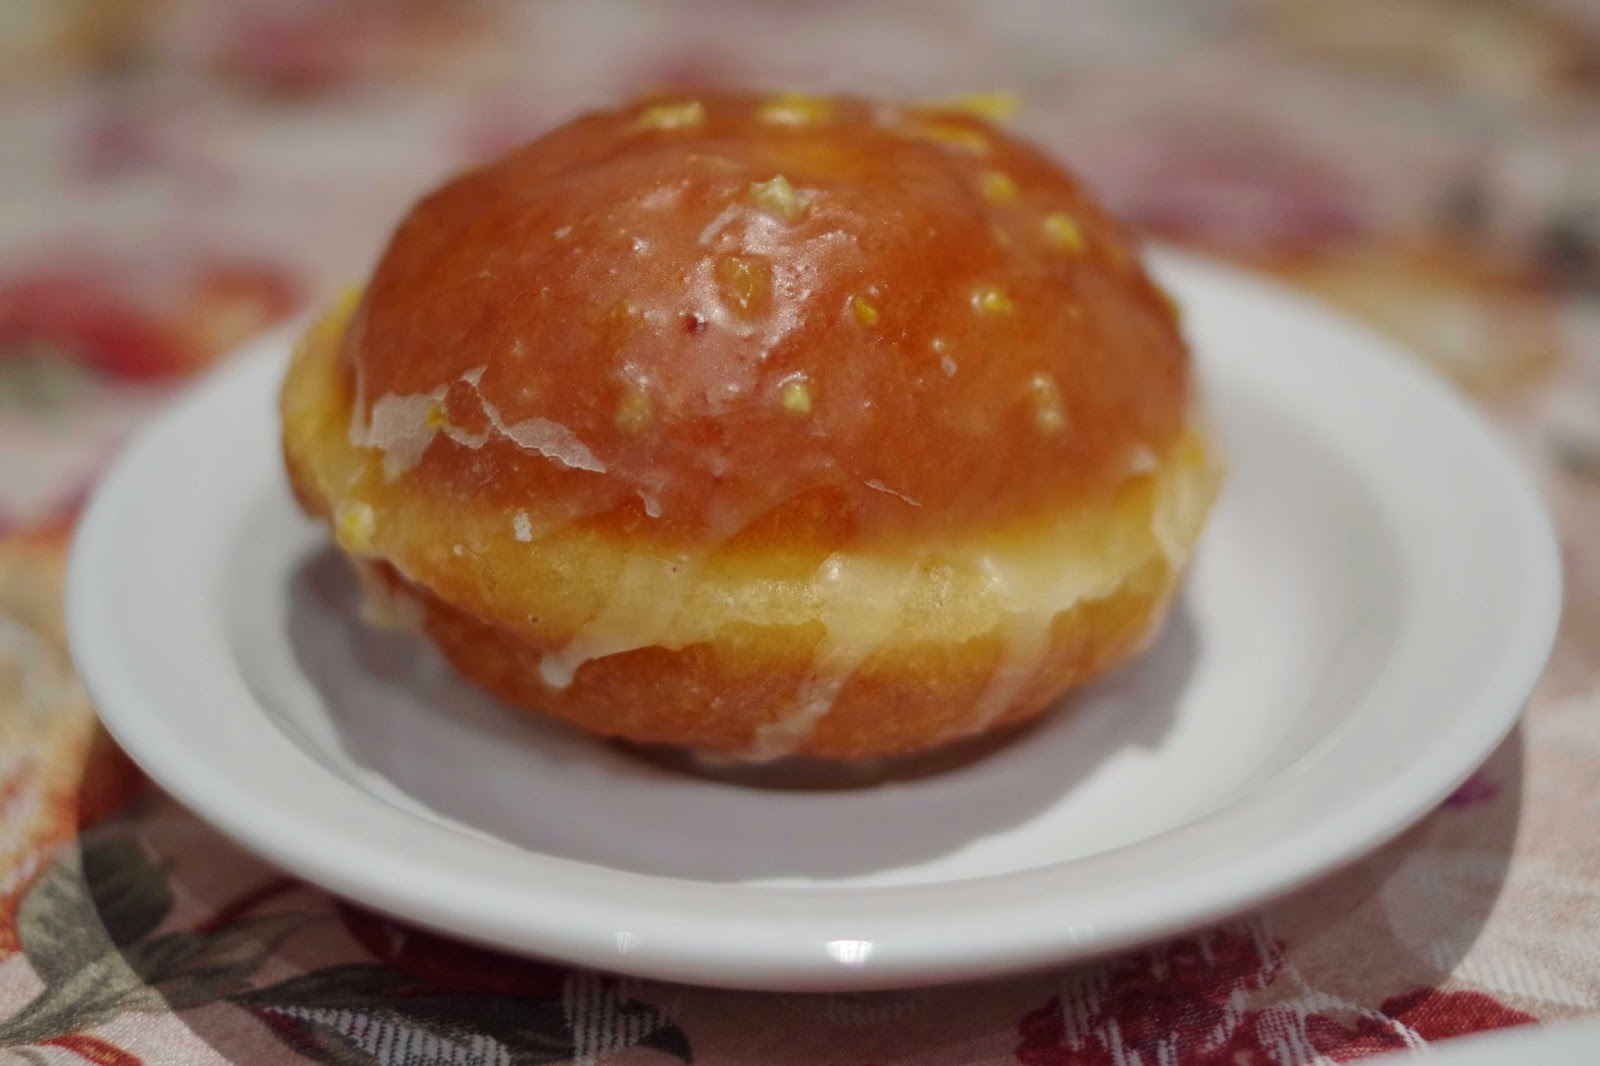 Paczek (Traditional Polish donut)